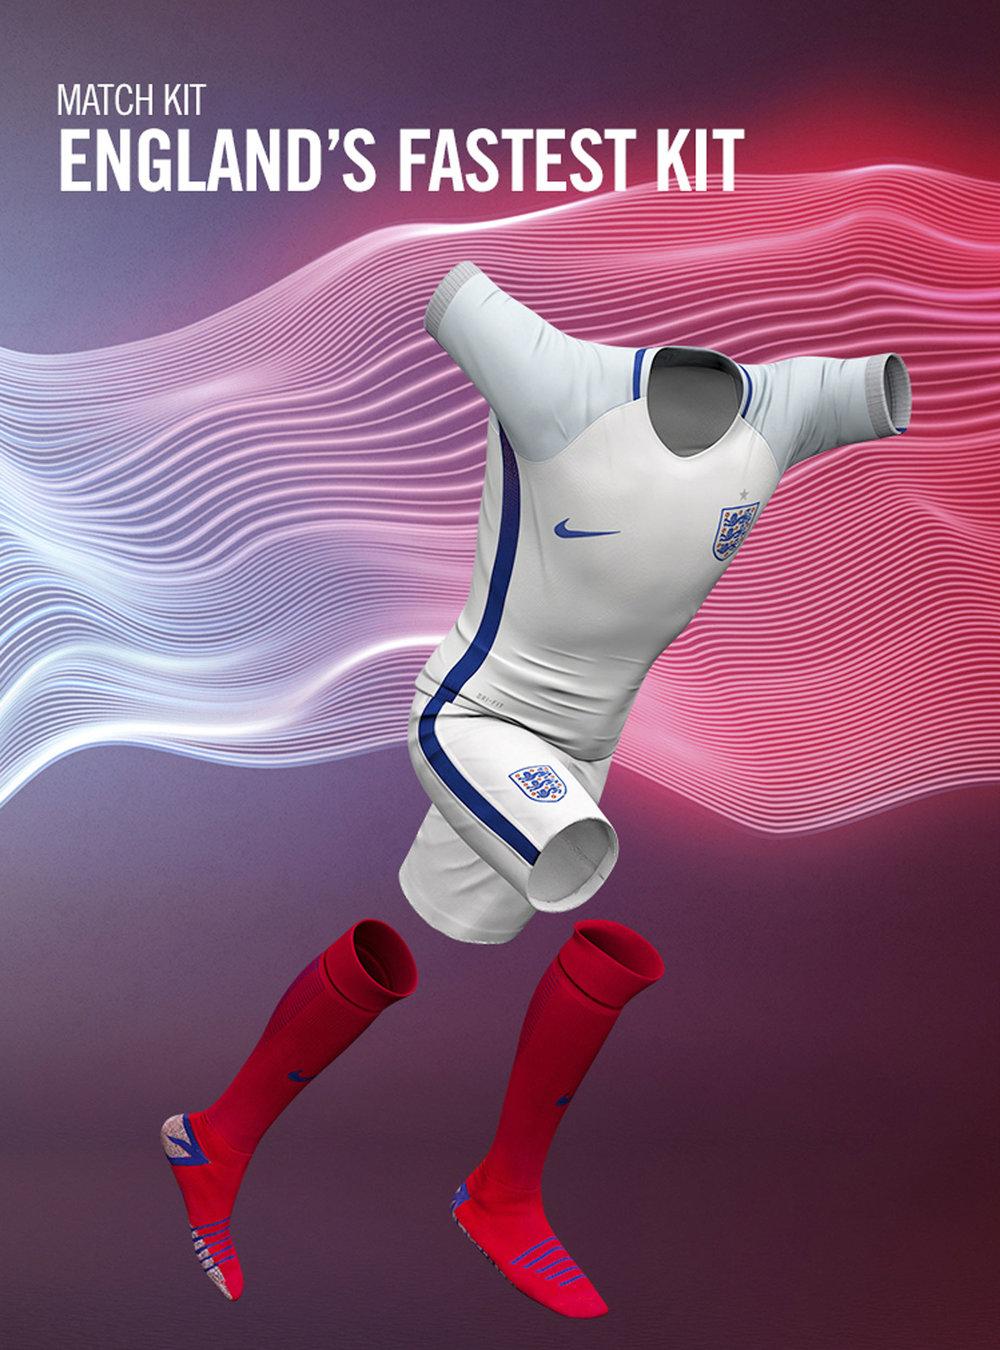 BOOM_CGI_SPORTS_nike-england-football-kit-01.jpg